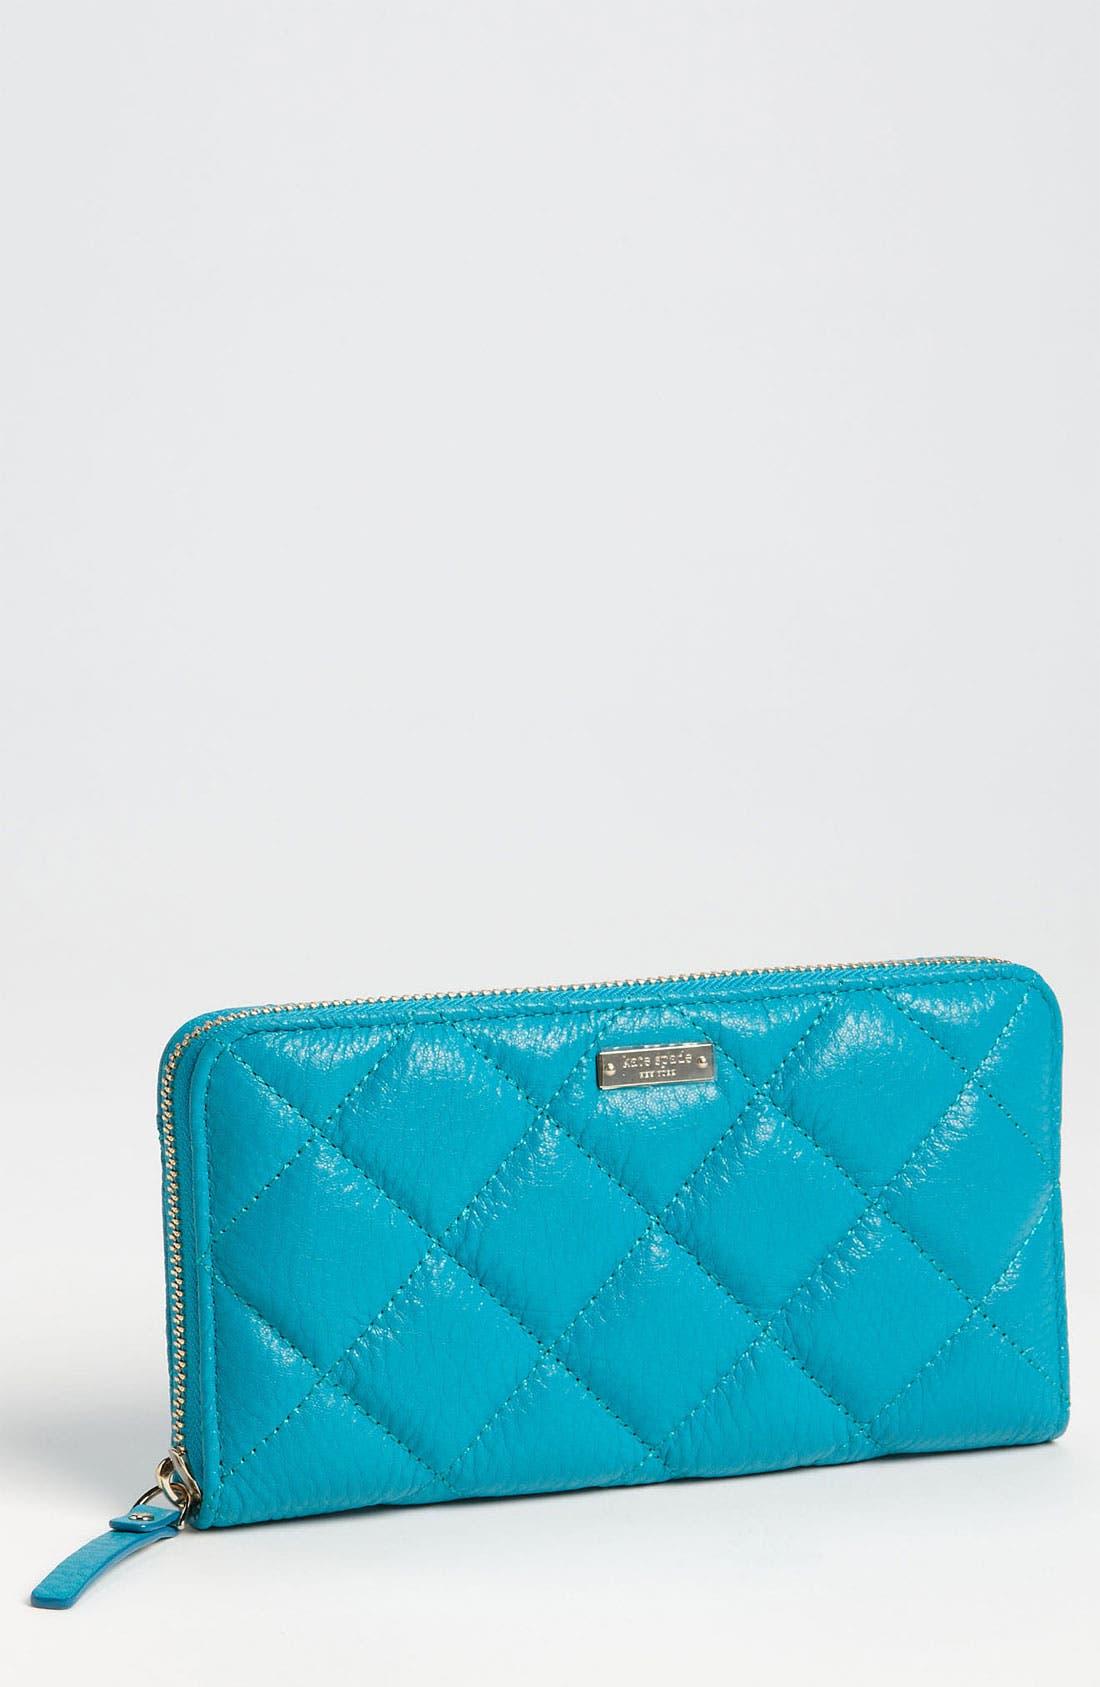 Main Image - kate spade new york 'gold coast - lacey' zip around wallet